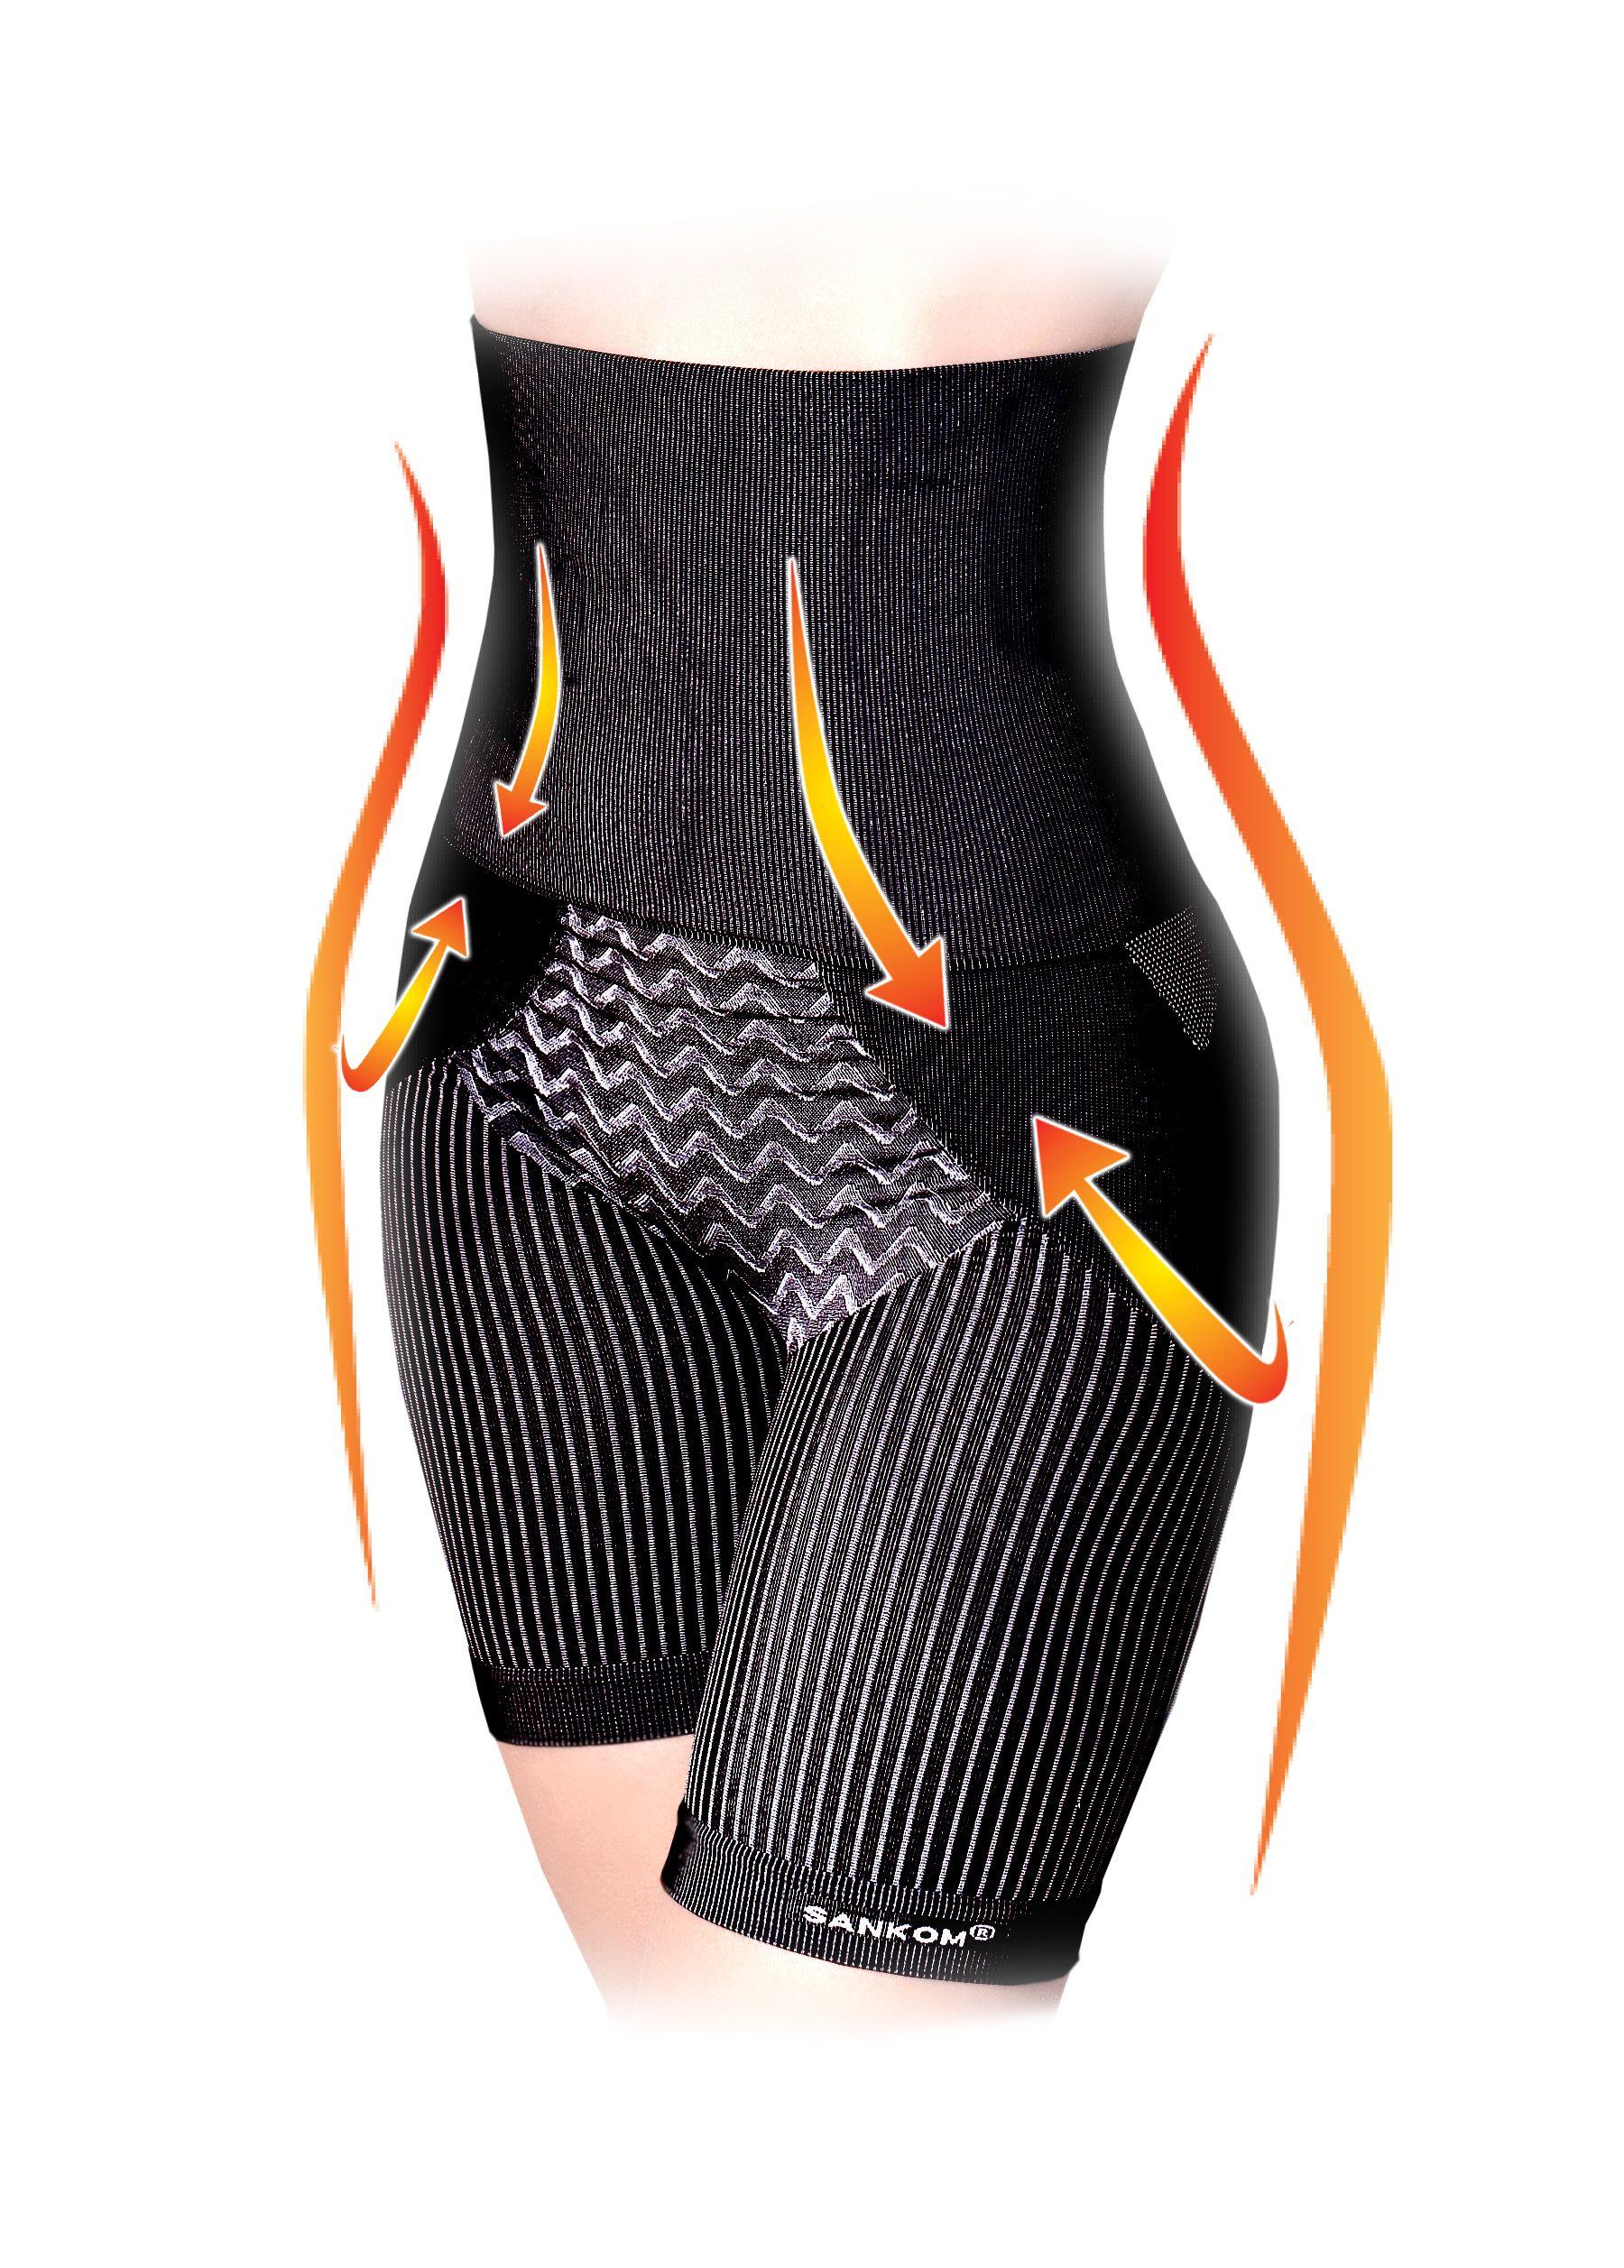 fed8973929ea4 Women s SANKOM Shaper - Aloe Shorts